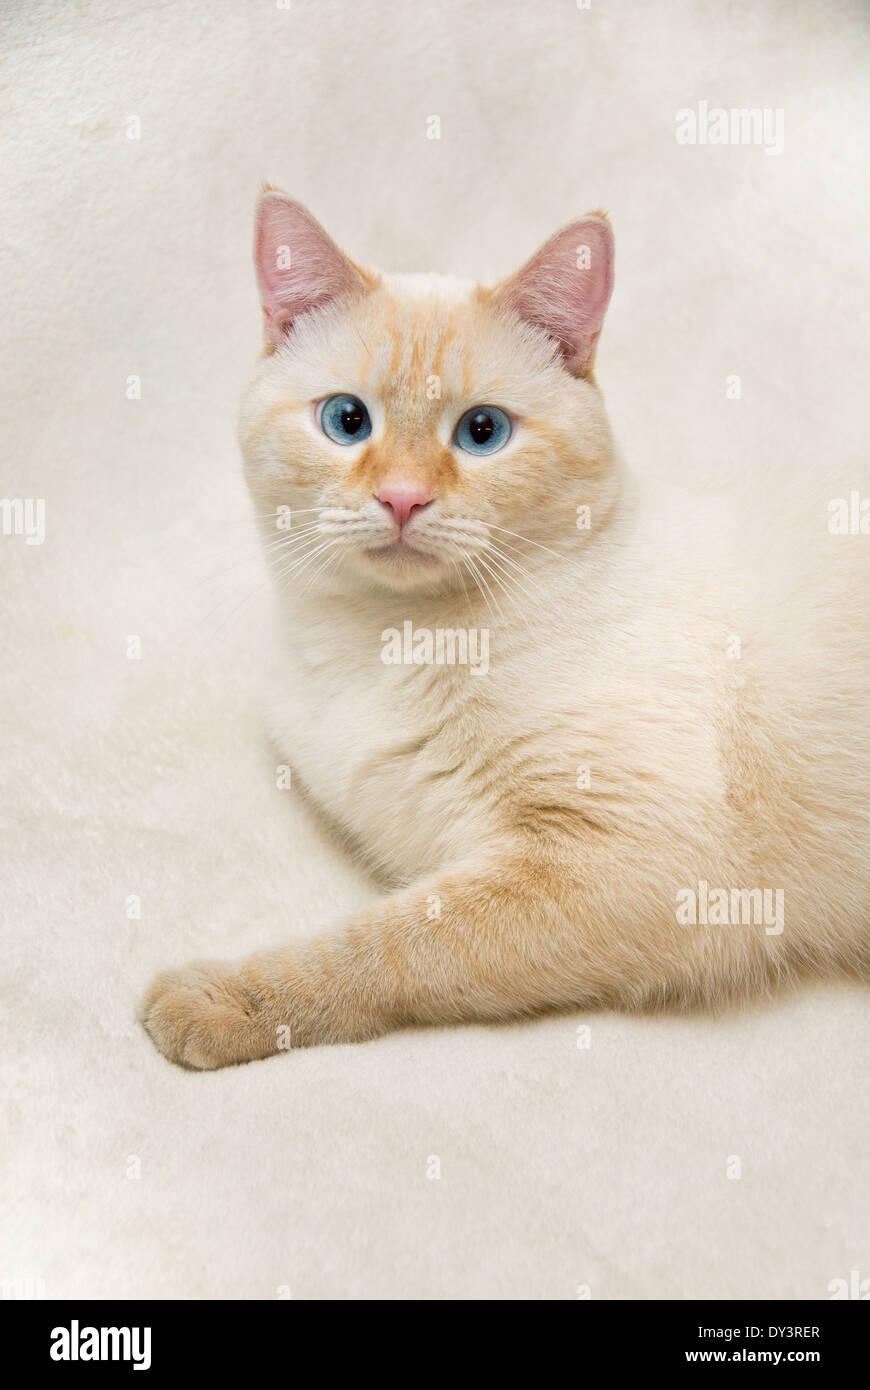 Blue Tip Cat